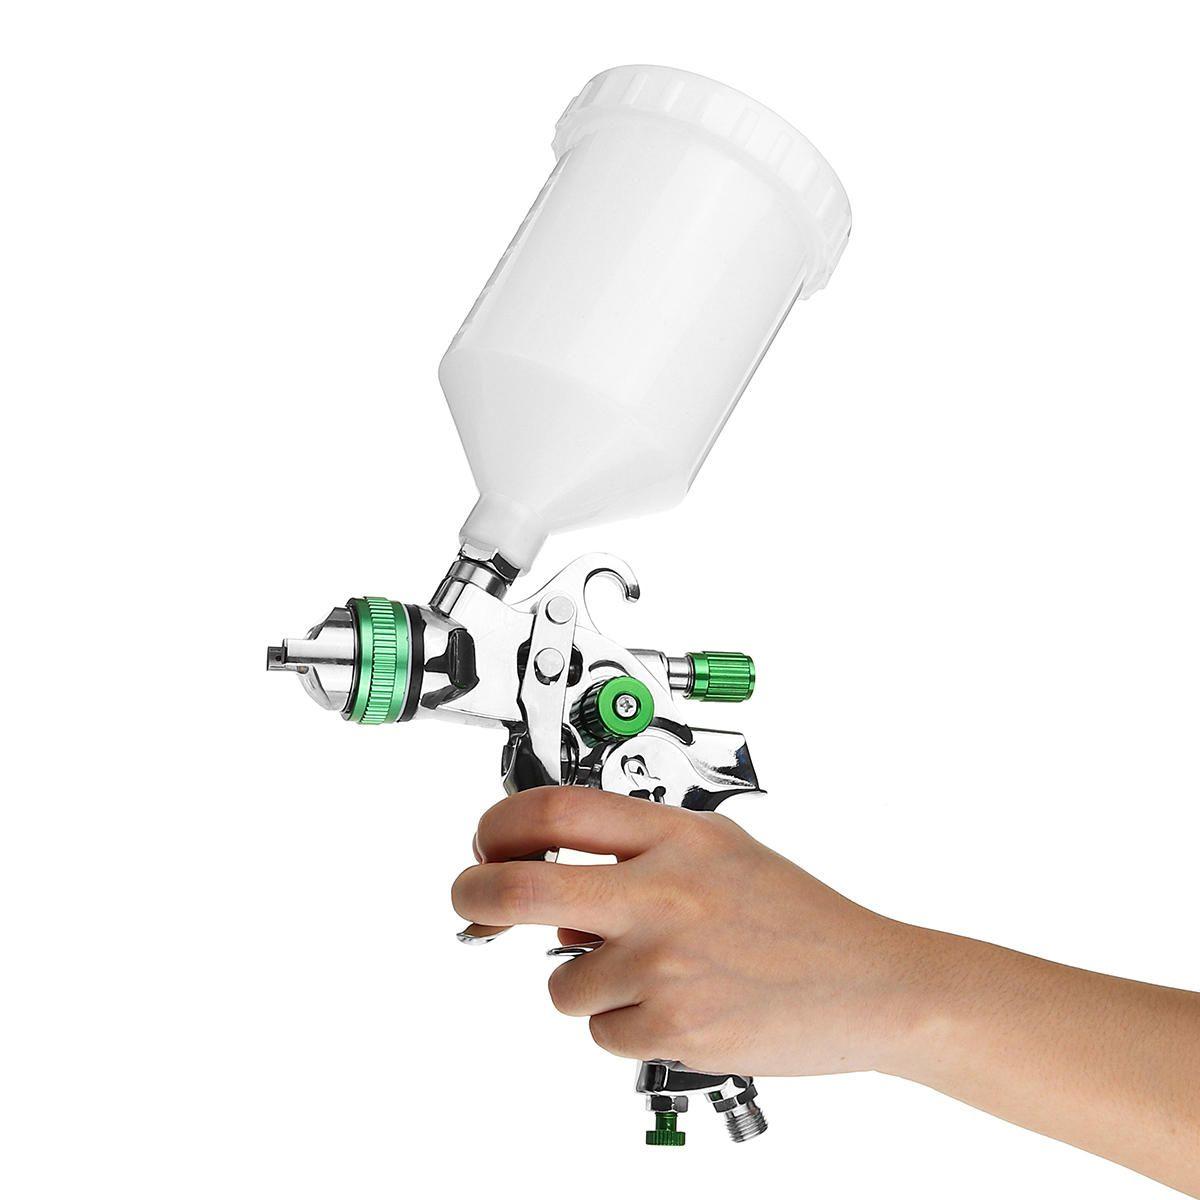 G2008 HVLP 1.4mm 600ml Paint Airbrush Sprayer Paint High Efficiency Gravity Feed Car Primer